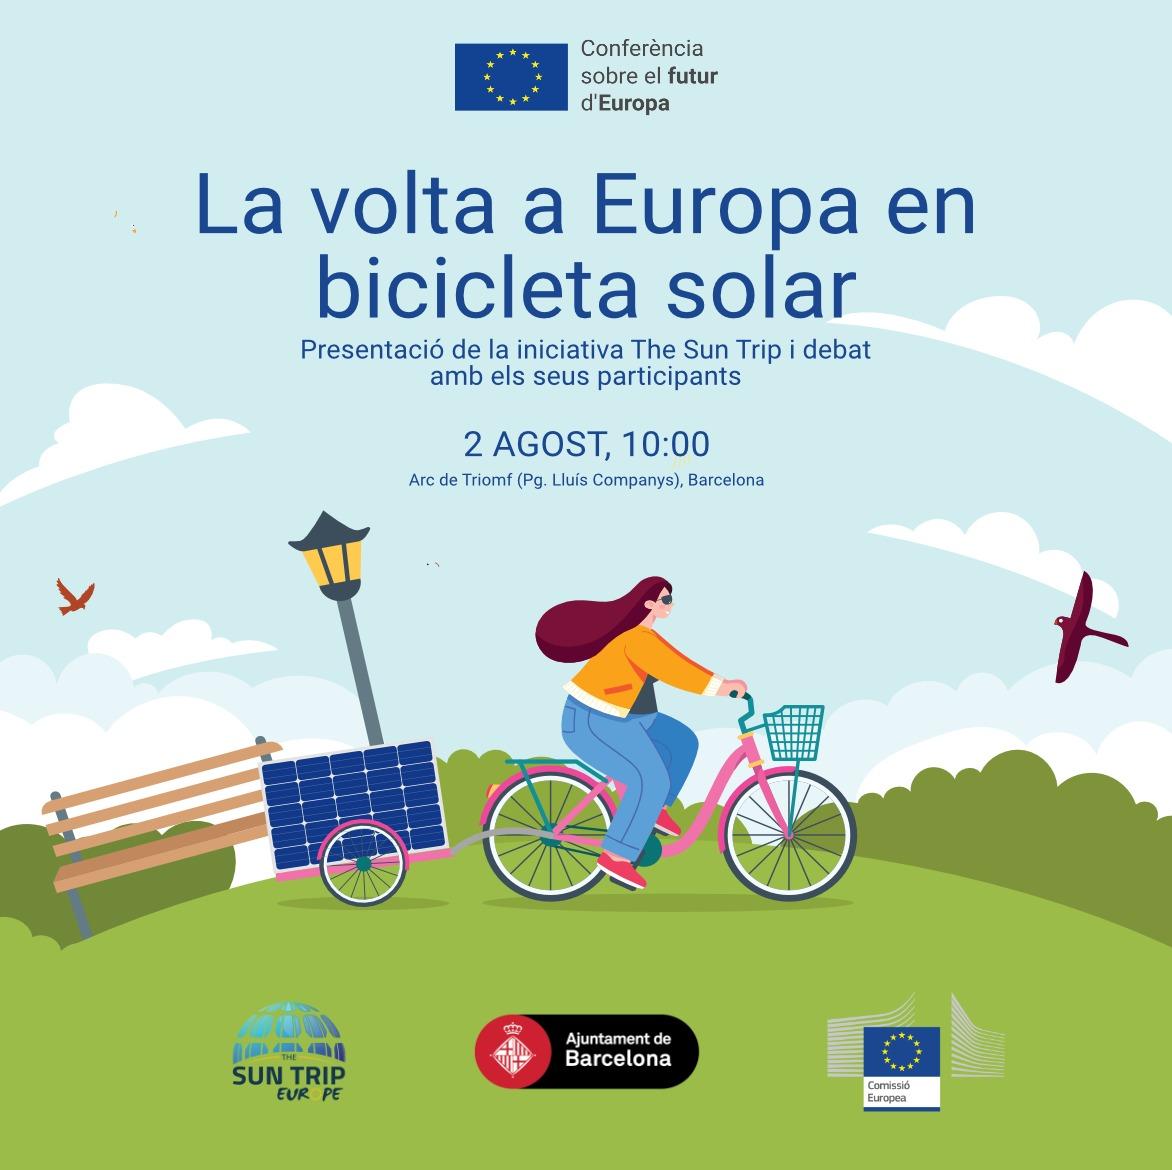 La volta a Europa en bicicleta solar